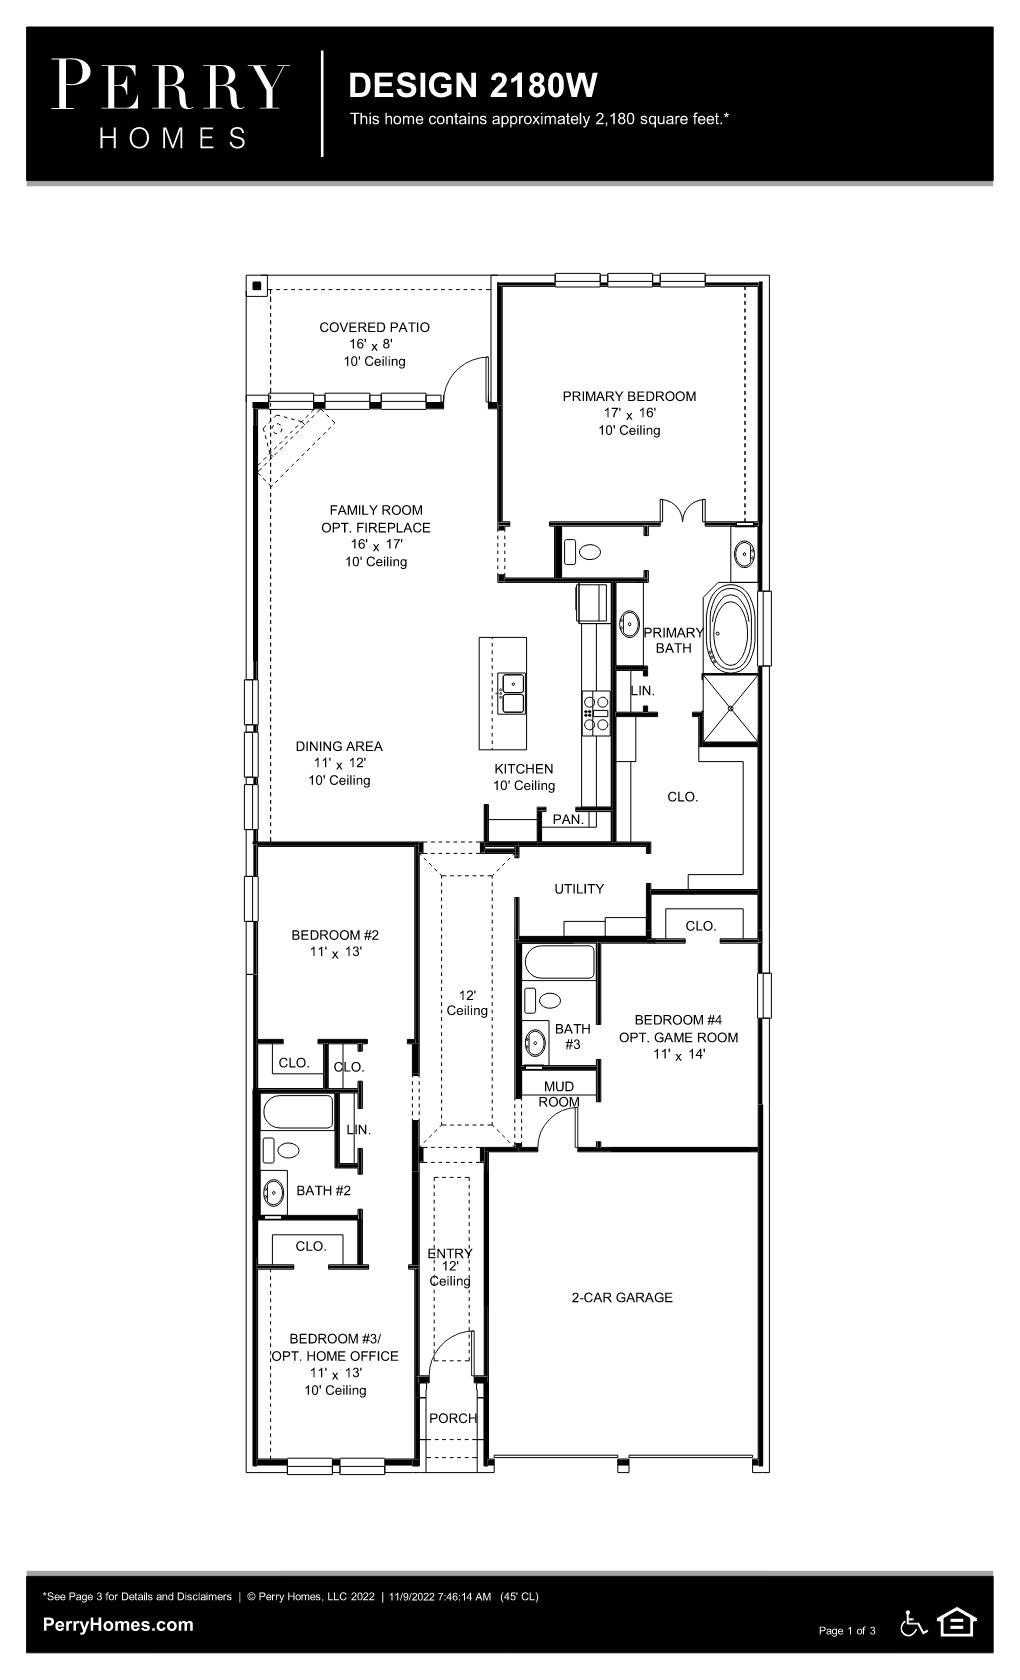 Floor Plan for 2180W